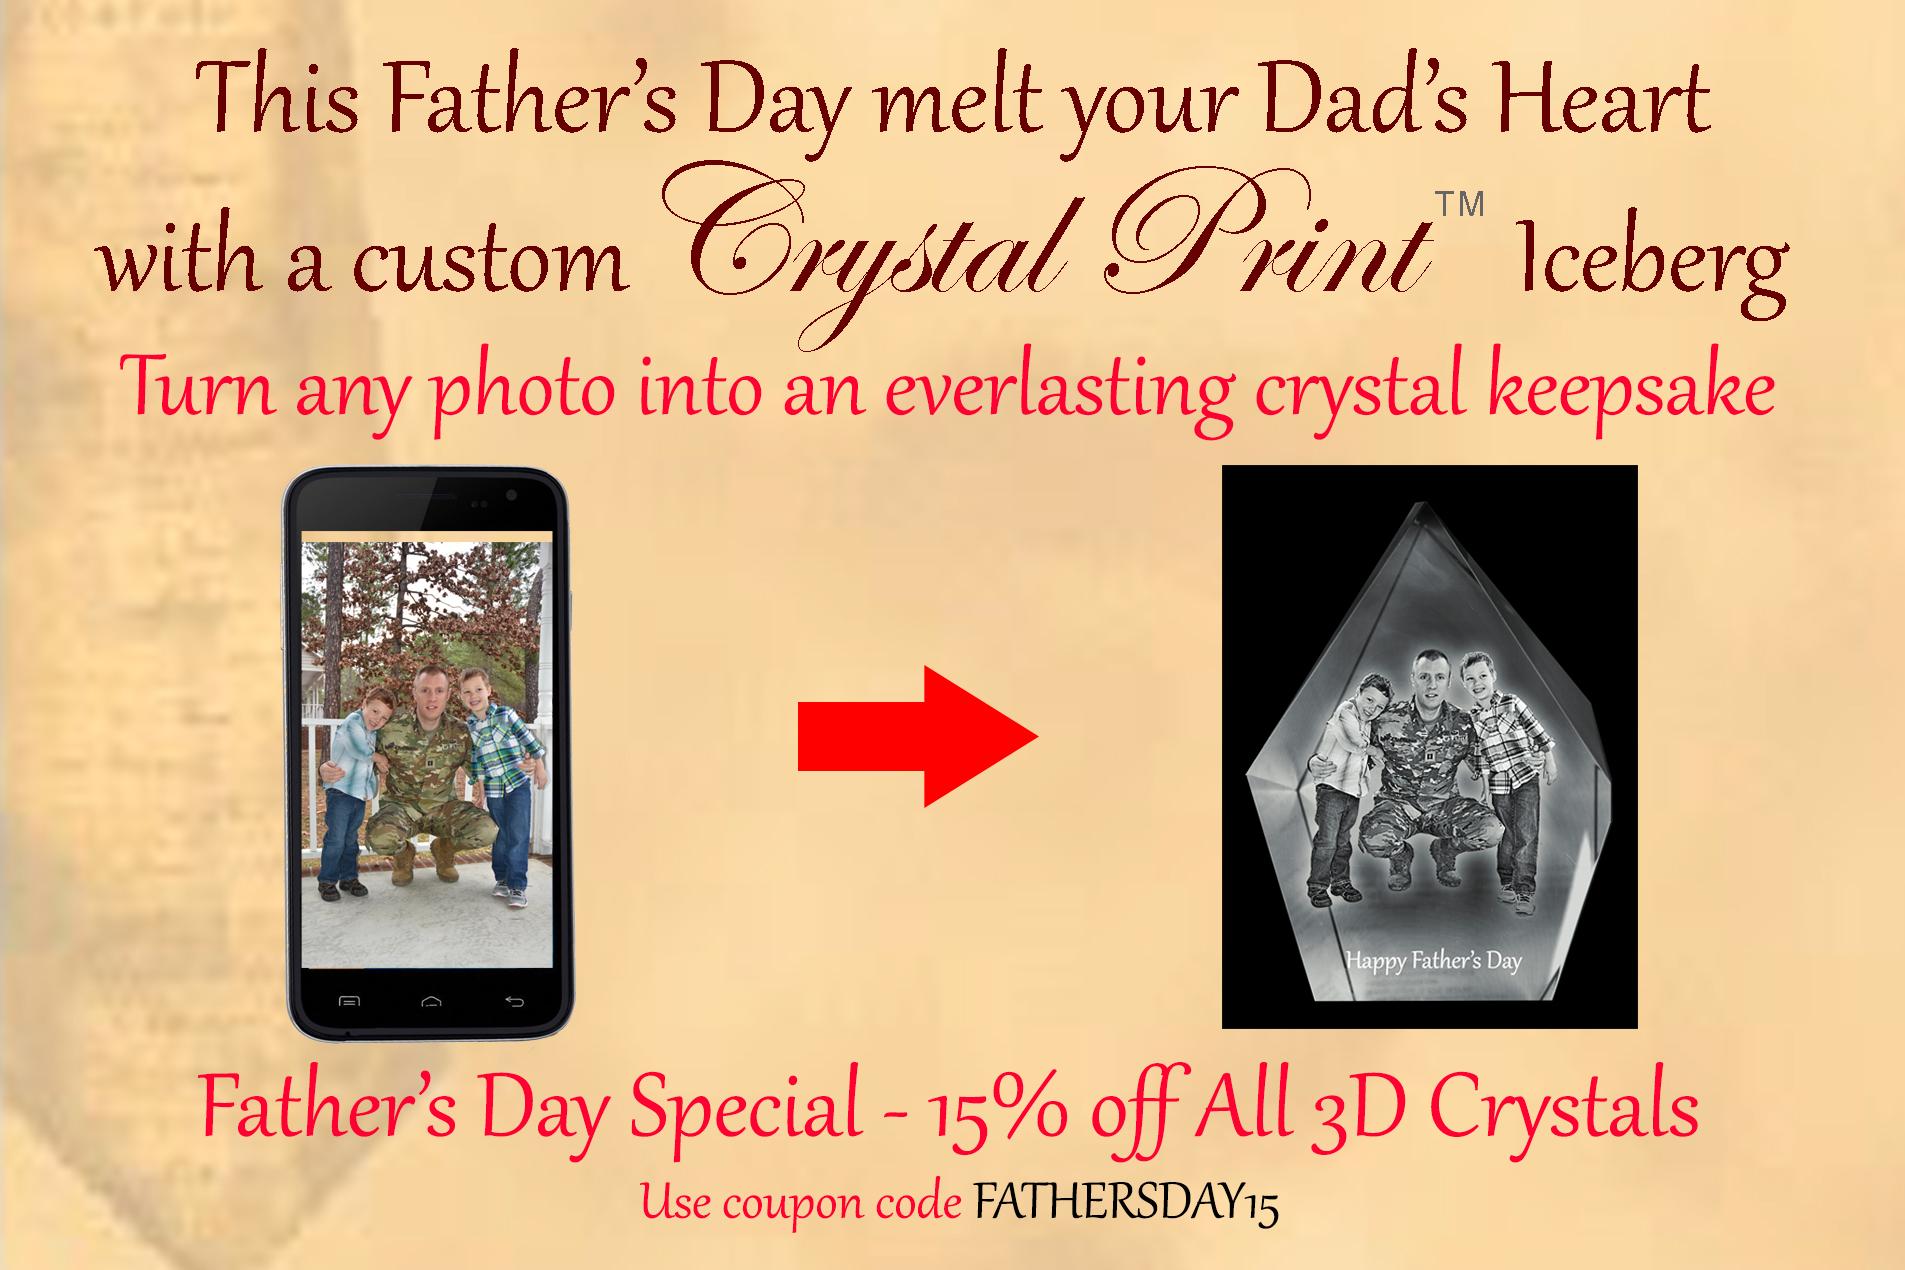 fathers-day-3d-blocks-ad.jpg